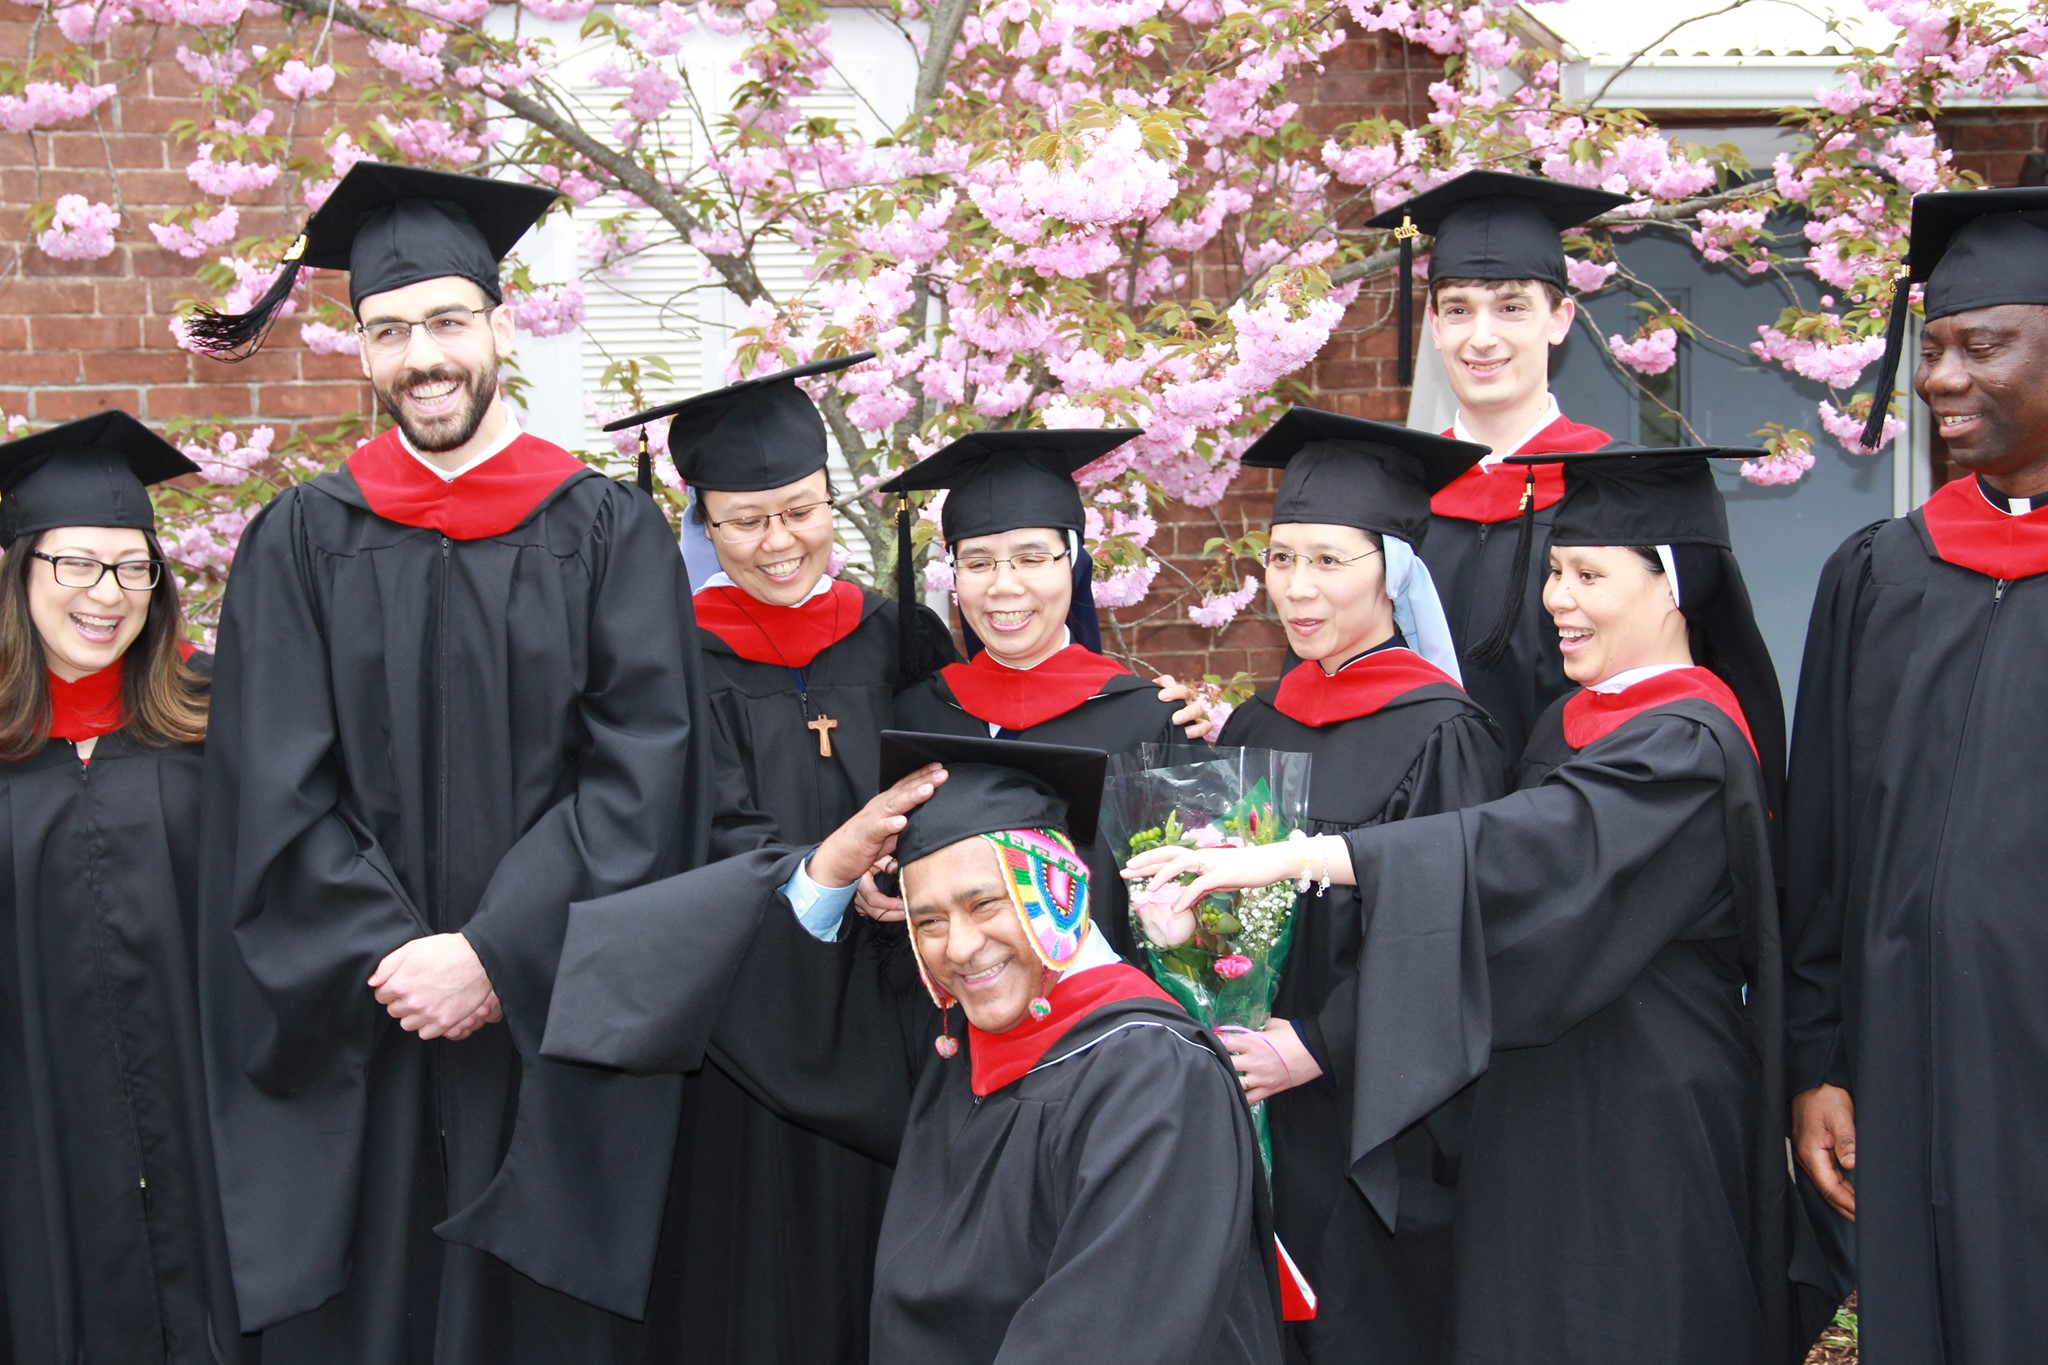 2019 graduates small group